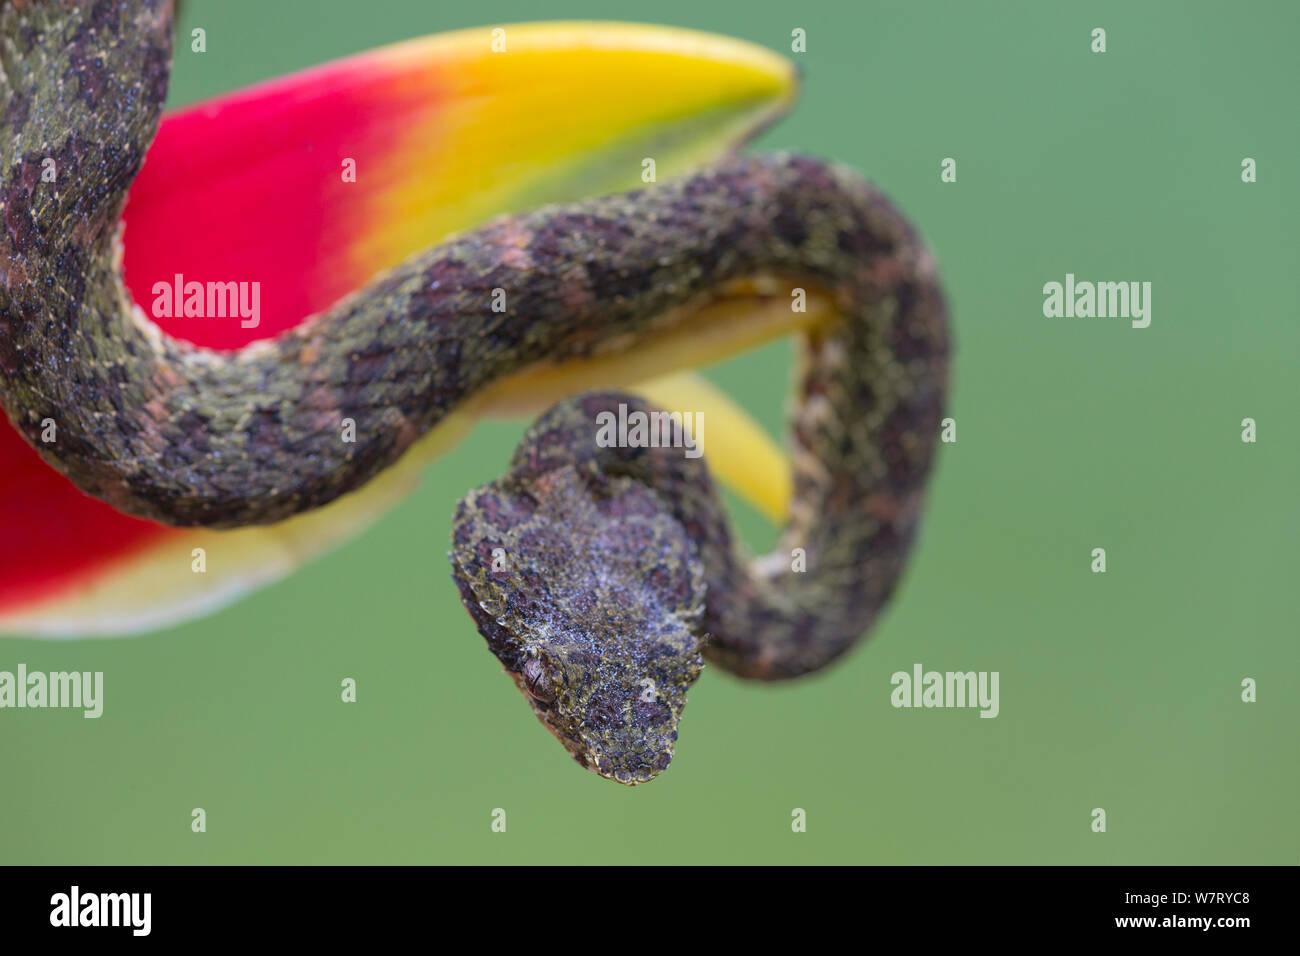 Eyelash Viper (Bothriechis schlegelii) on Heliconia (Heliconia rostrata) Costa Rica. Stock Photo